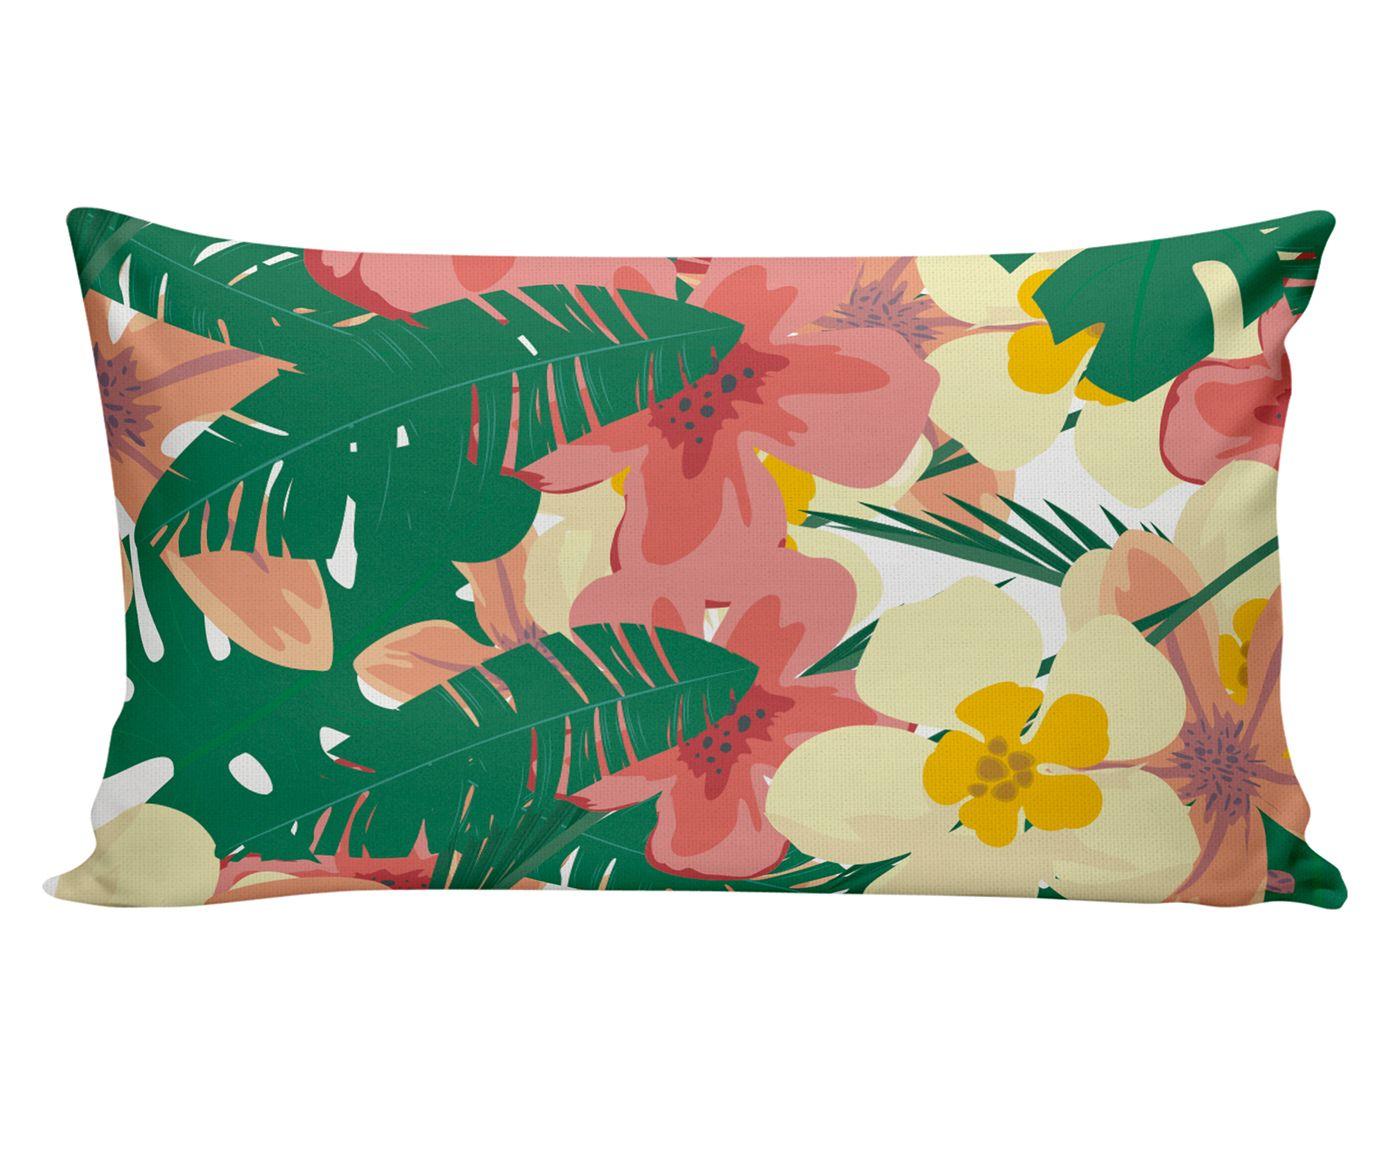 Capa de Almofada Trancoso Rachelle - 30x45cm   Westwing.com.br